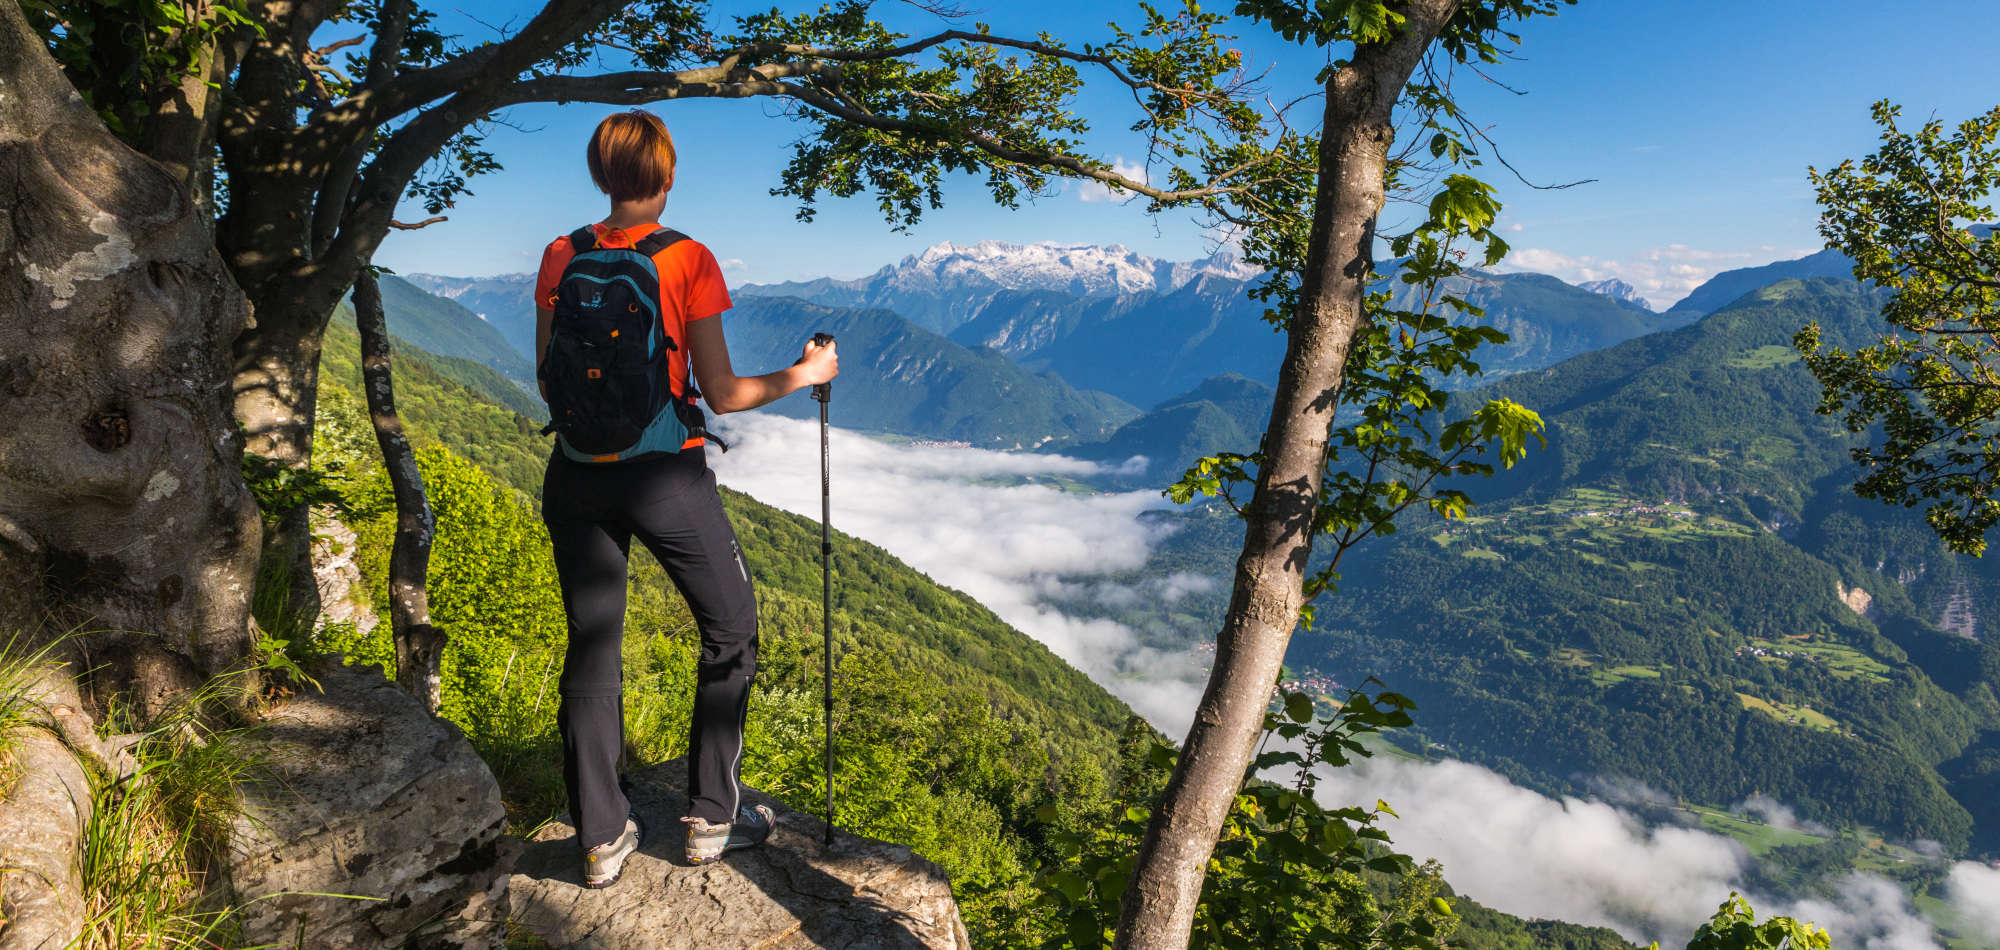 Alpe-Adria-Trail (Slovenia and Italy)